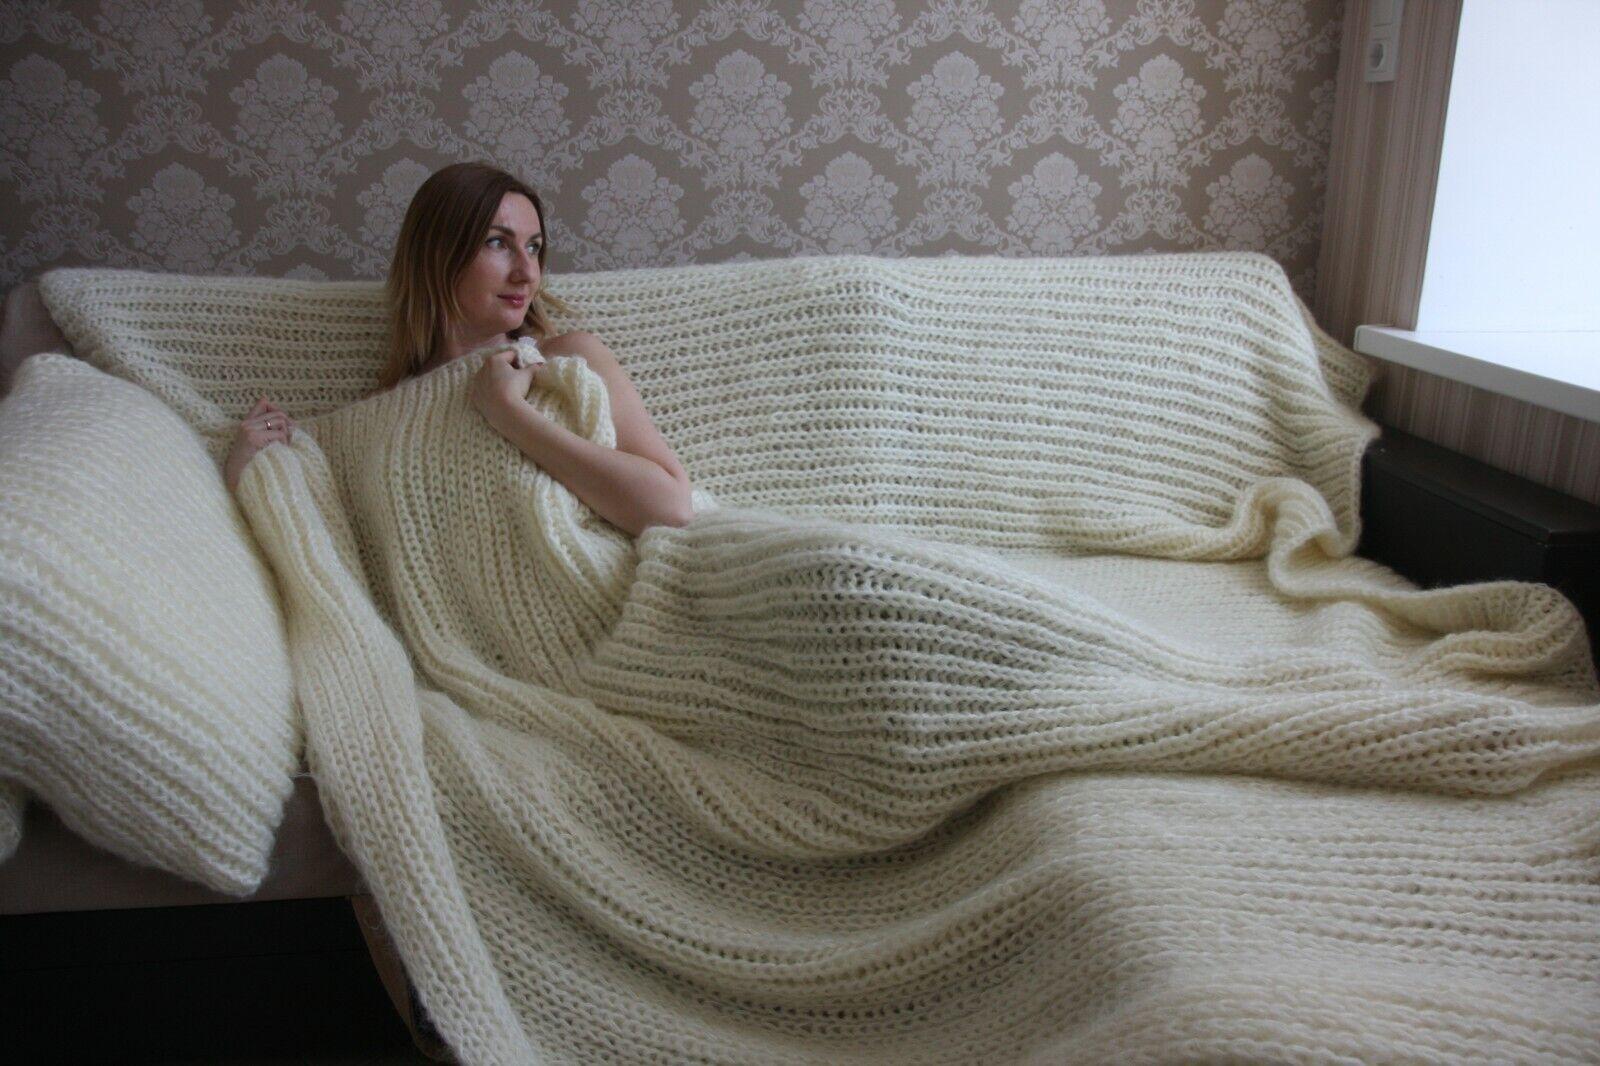 Premium Longhair Mohair Plaid Blanket Bedspread& 2 pillow cases hand knit Ivory